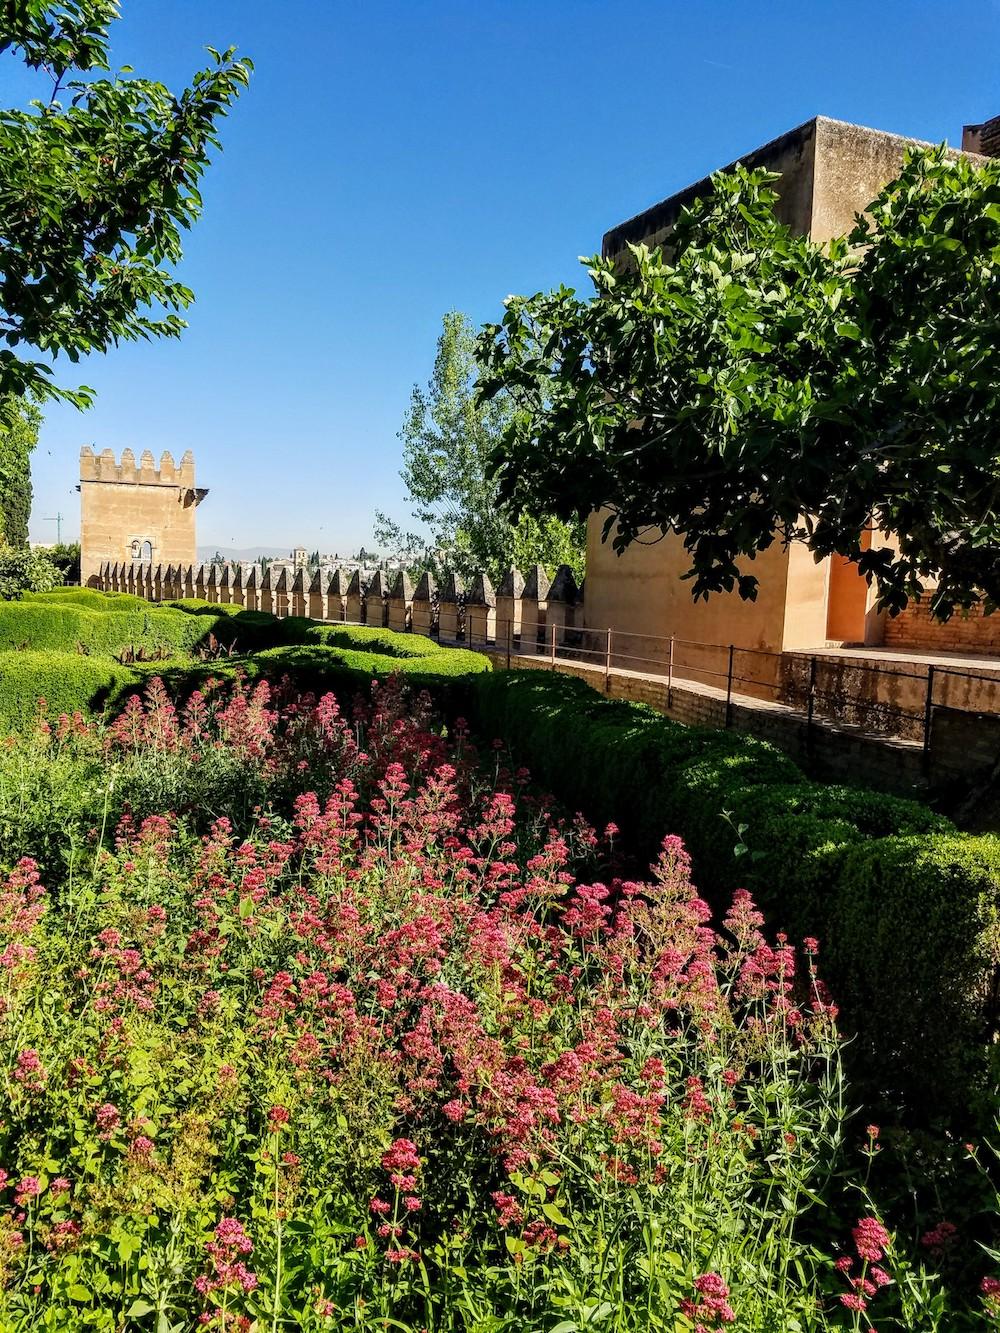 Alhambra Walls